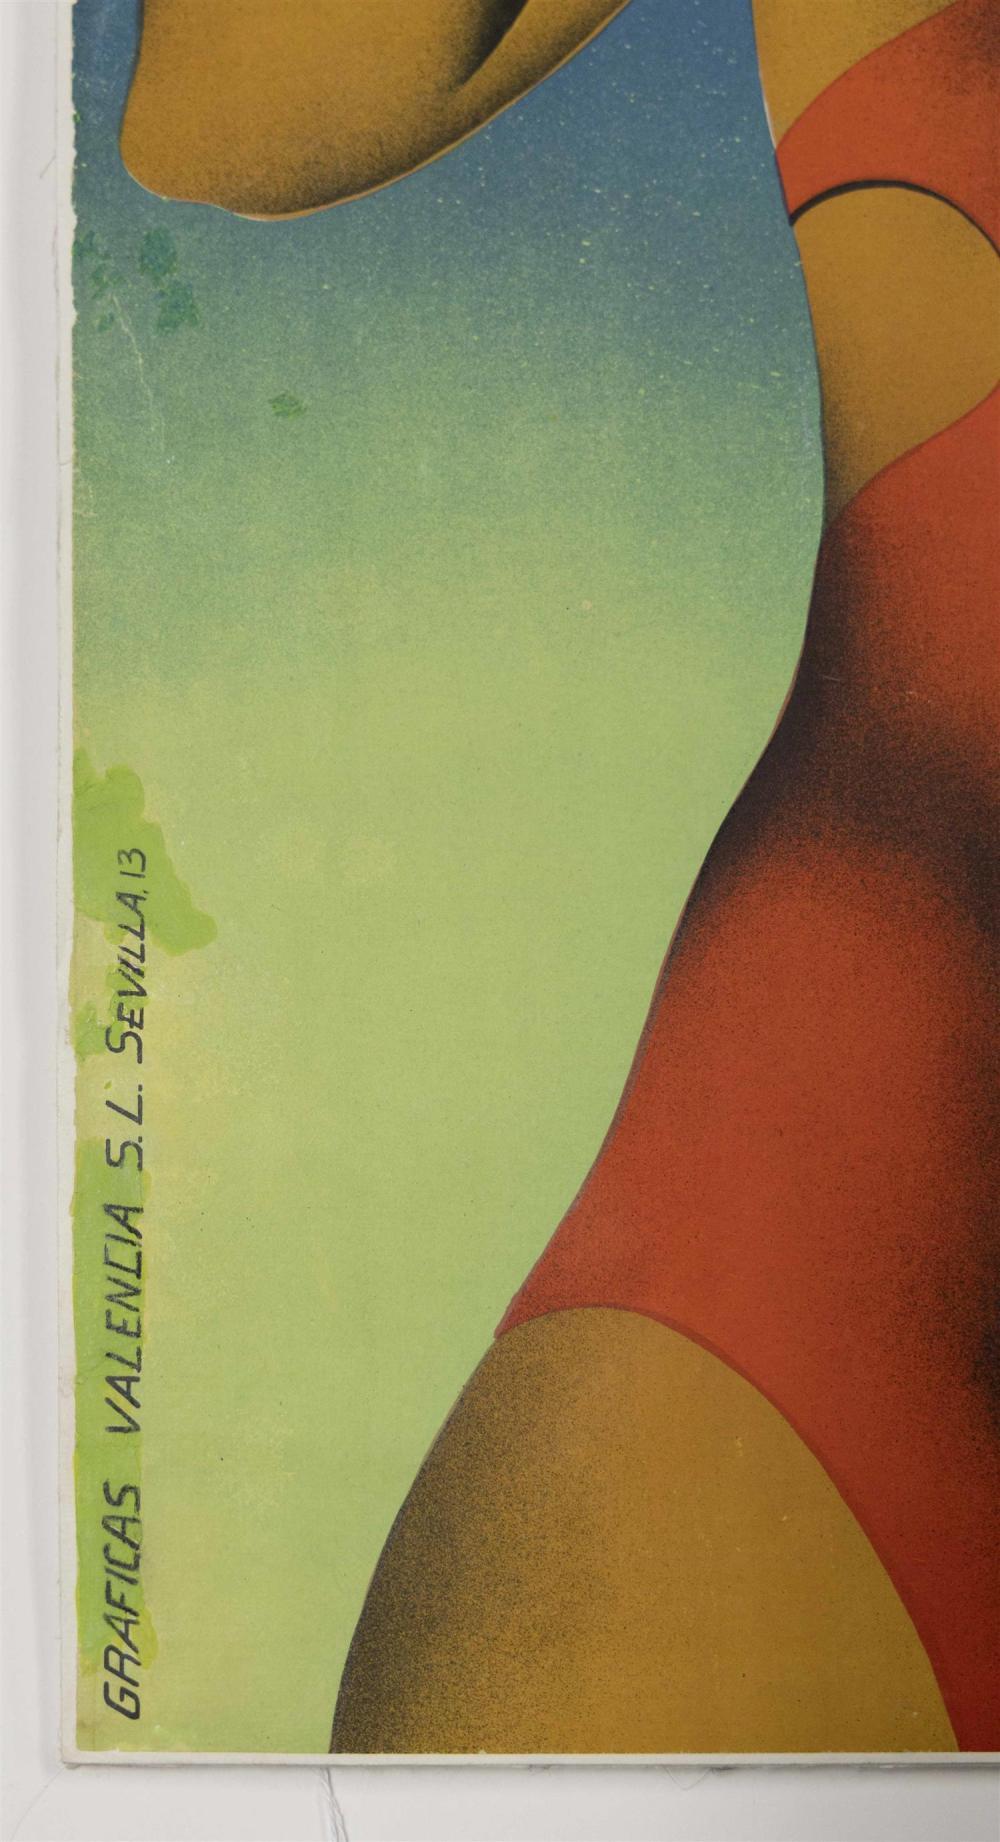 SPANISH ART DECO TRAVEL POSTER DESIGNED BY JOSEP RENAU-MONTORO